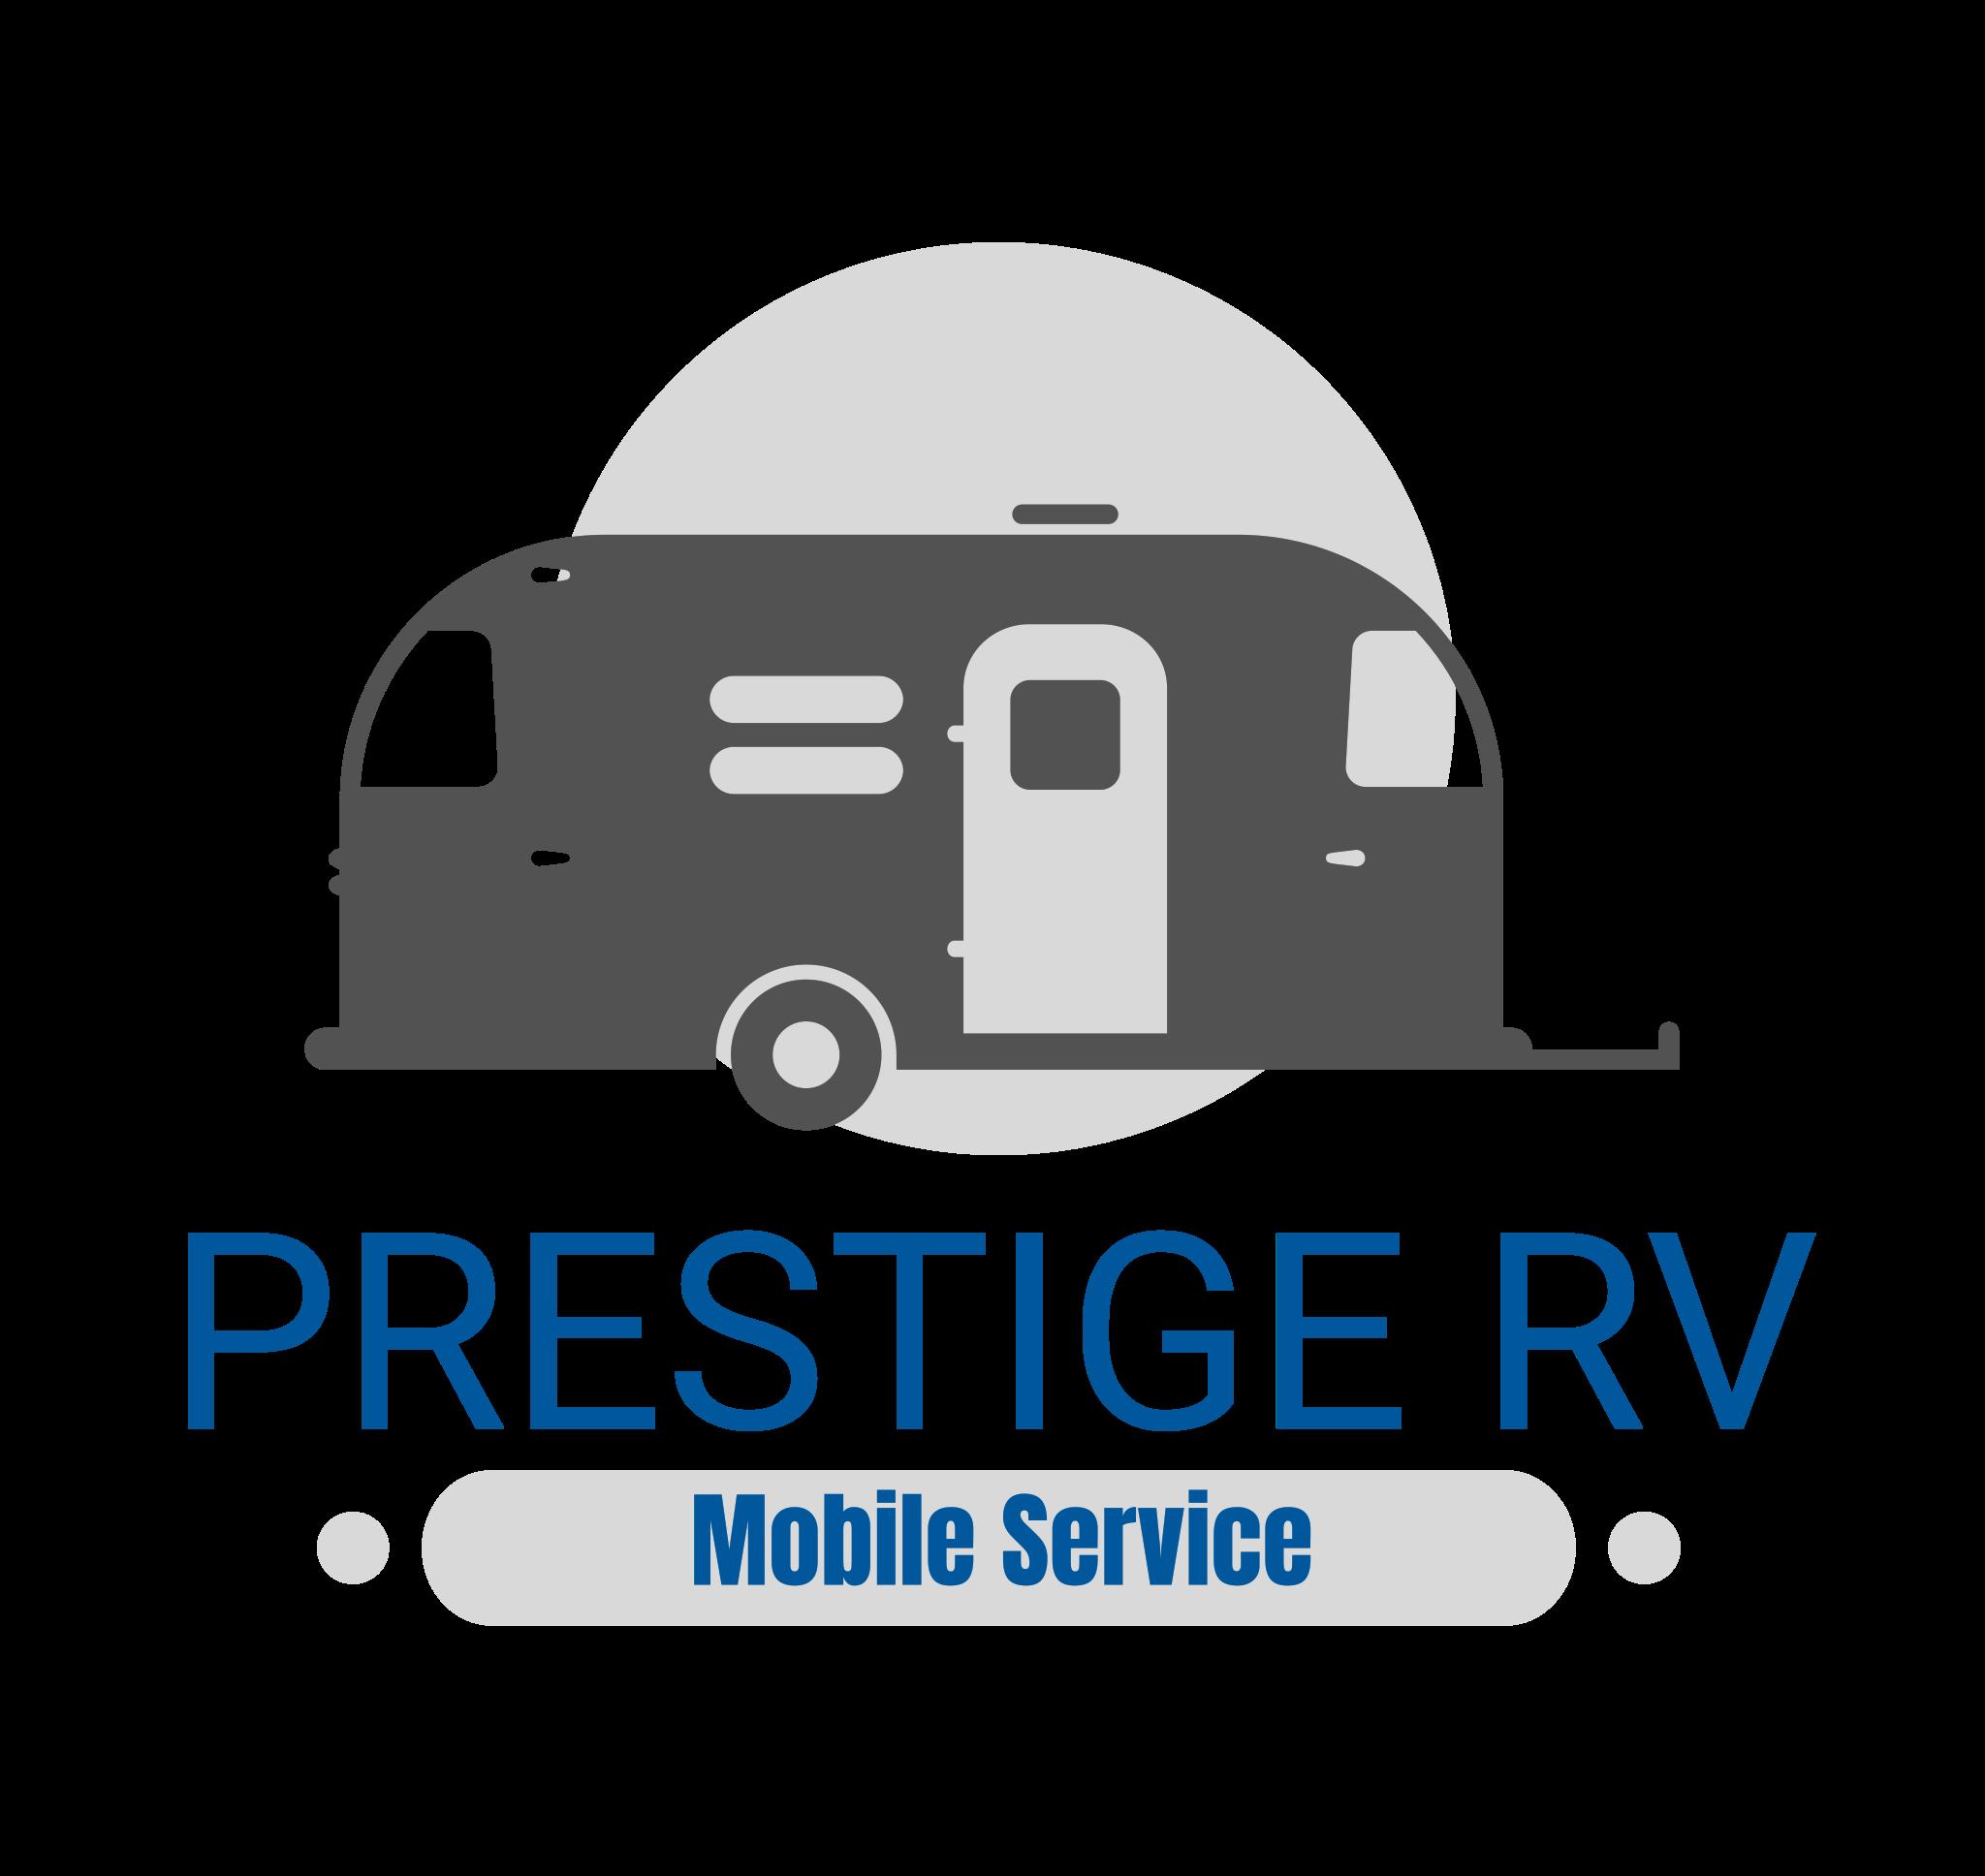 Prestige RV Mobile Service